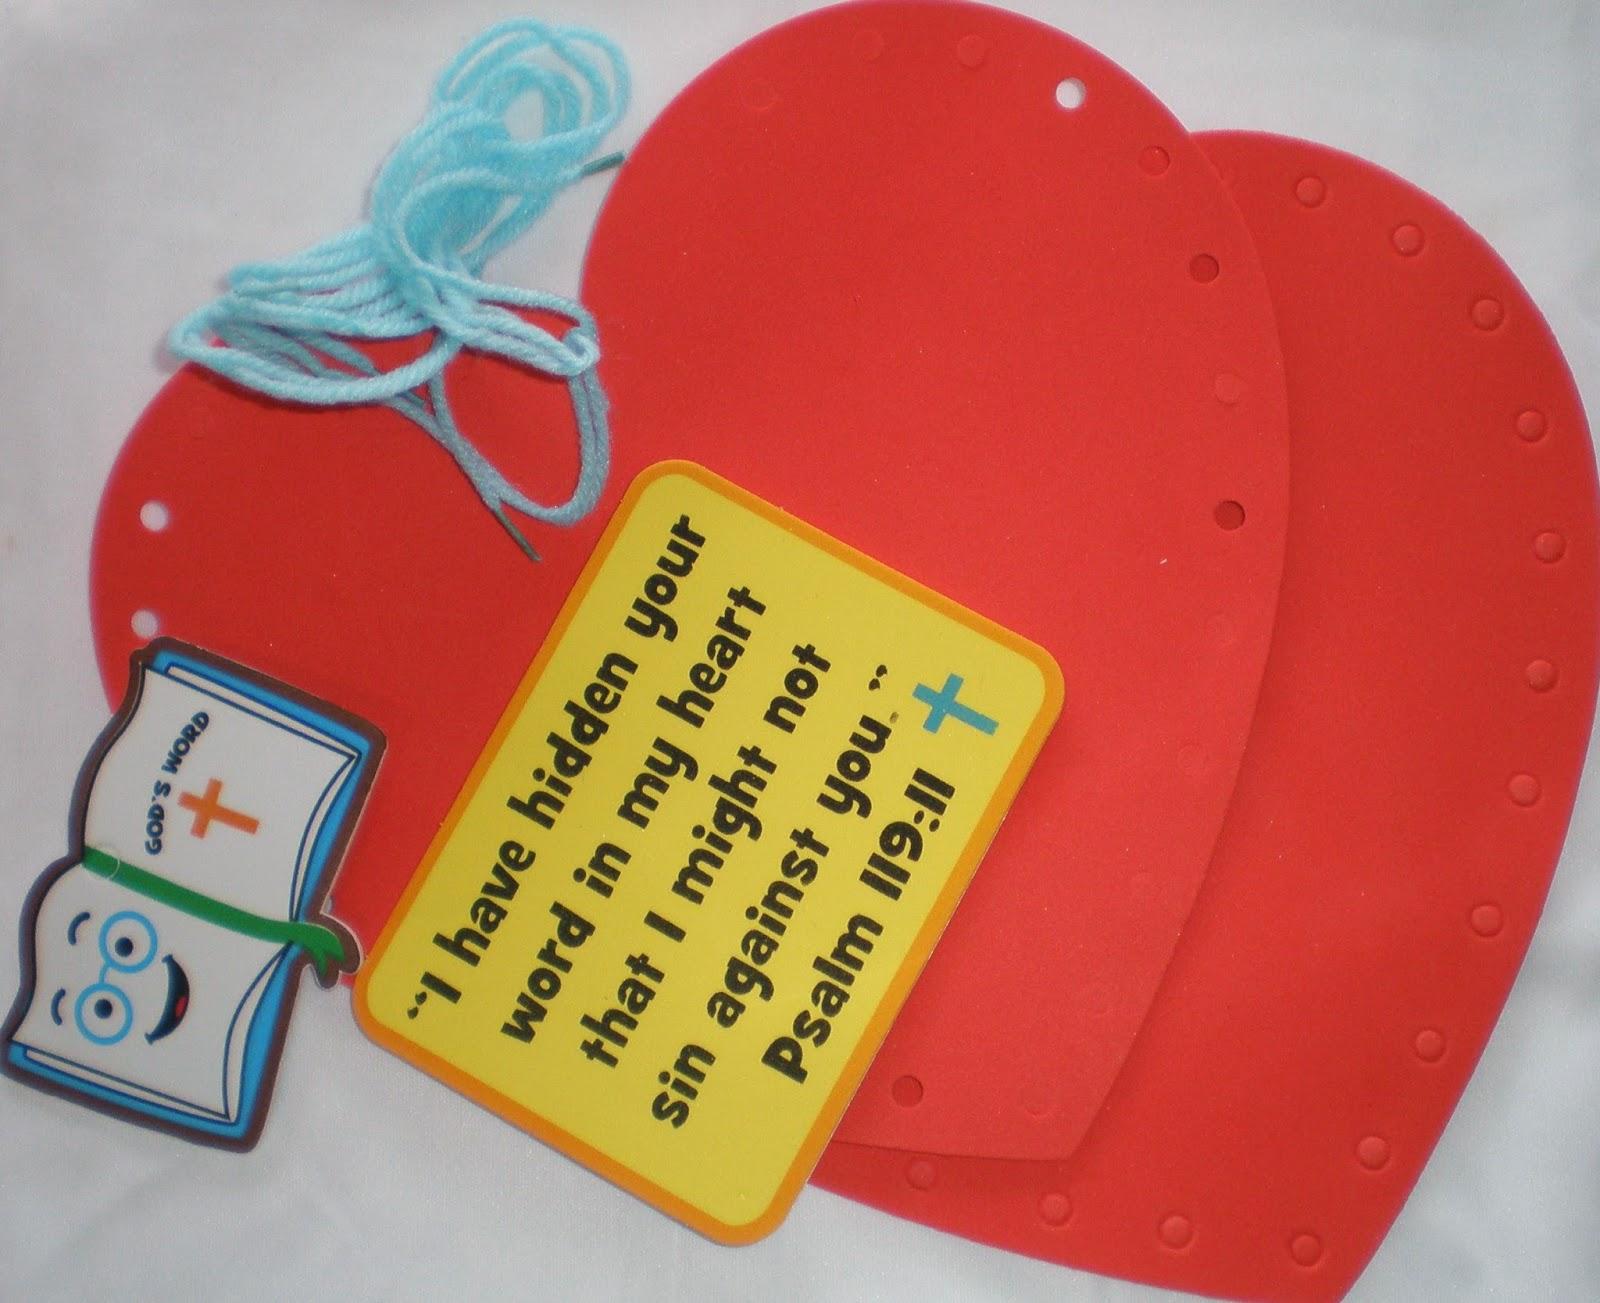 petersham bible book u0026 tract depot lacing heart craft kit